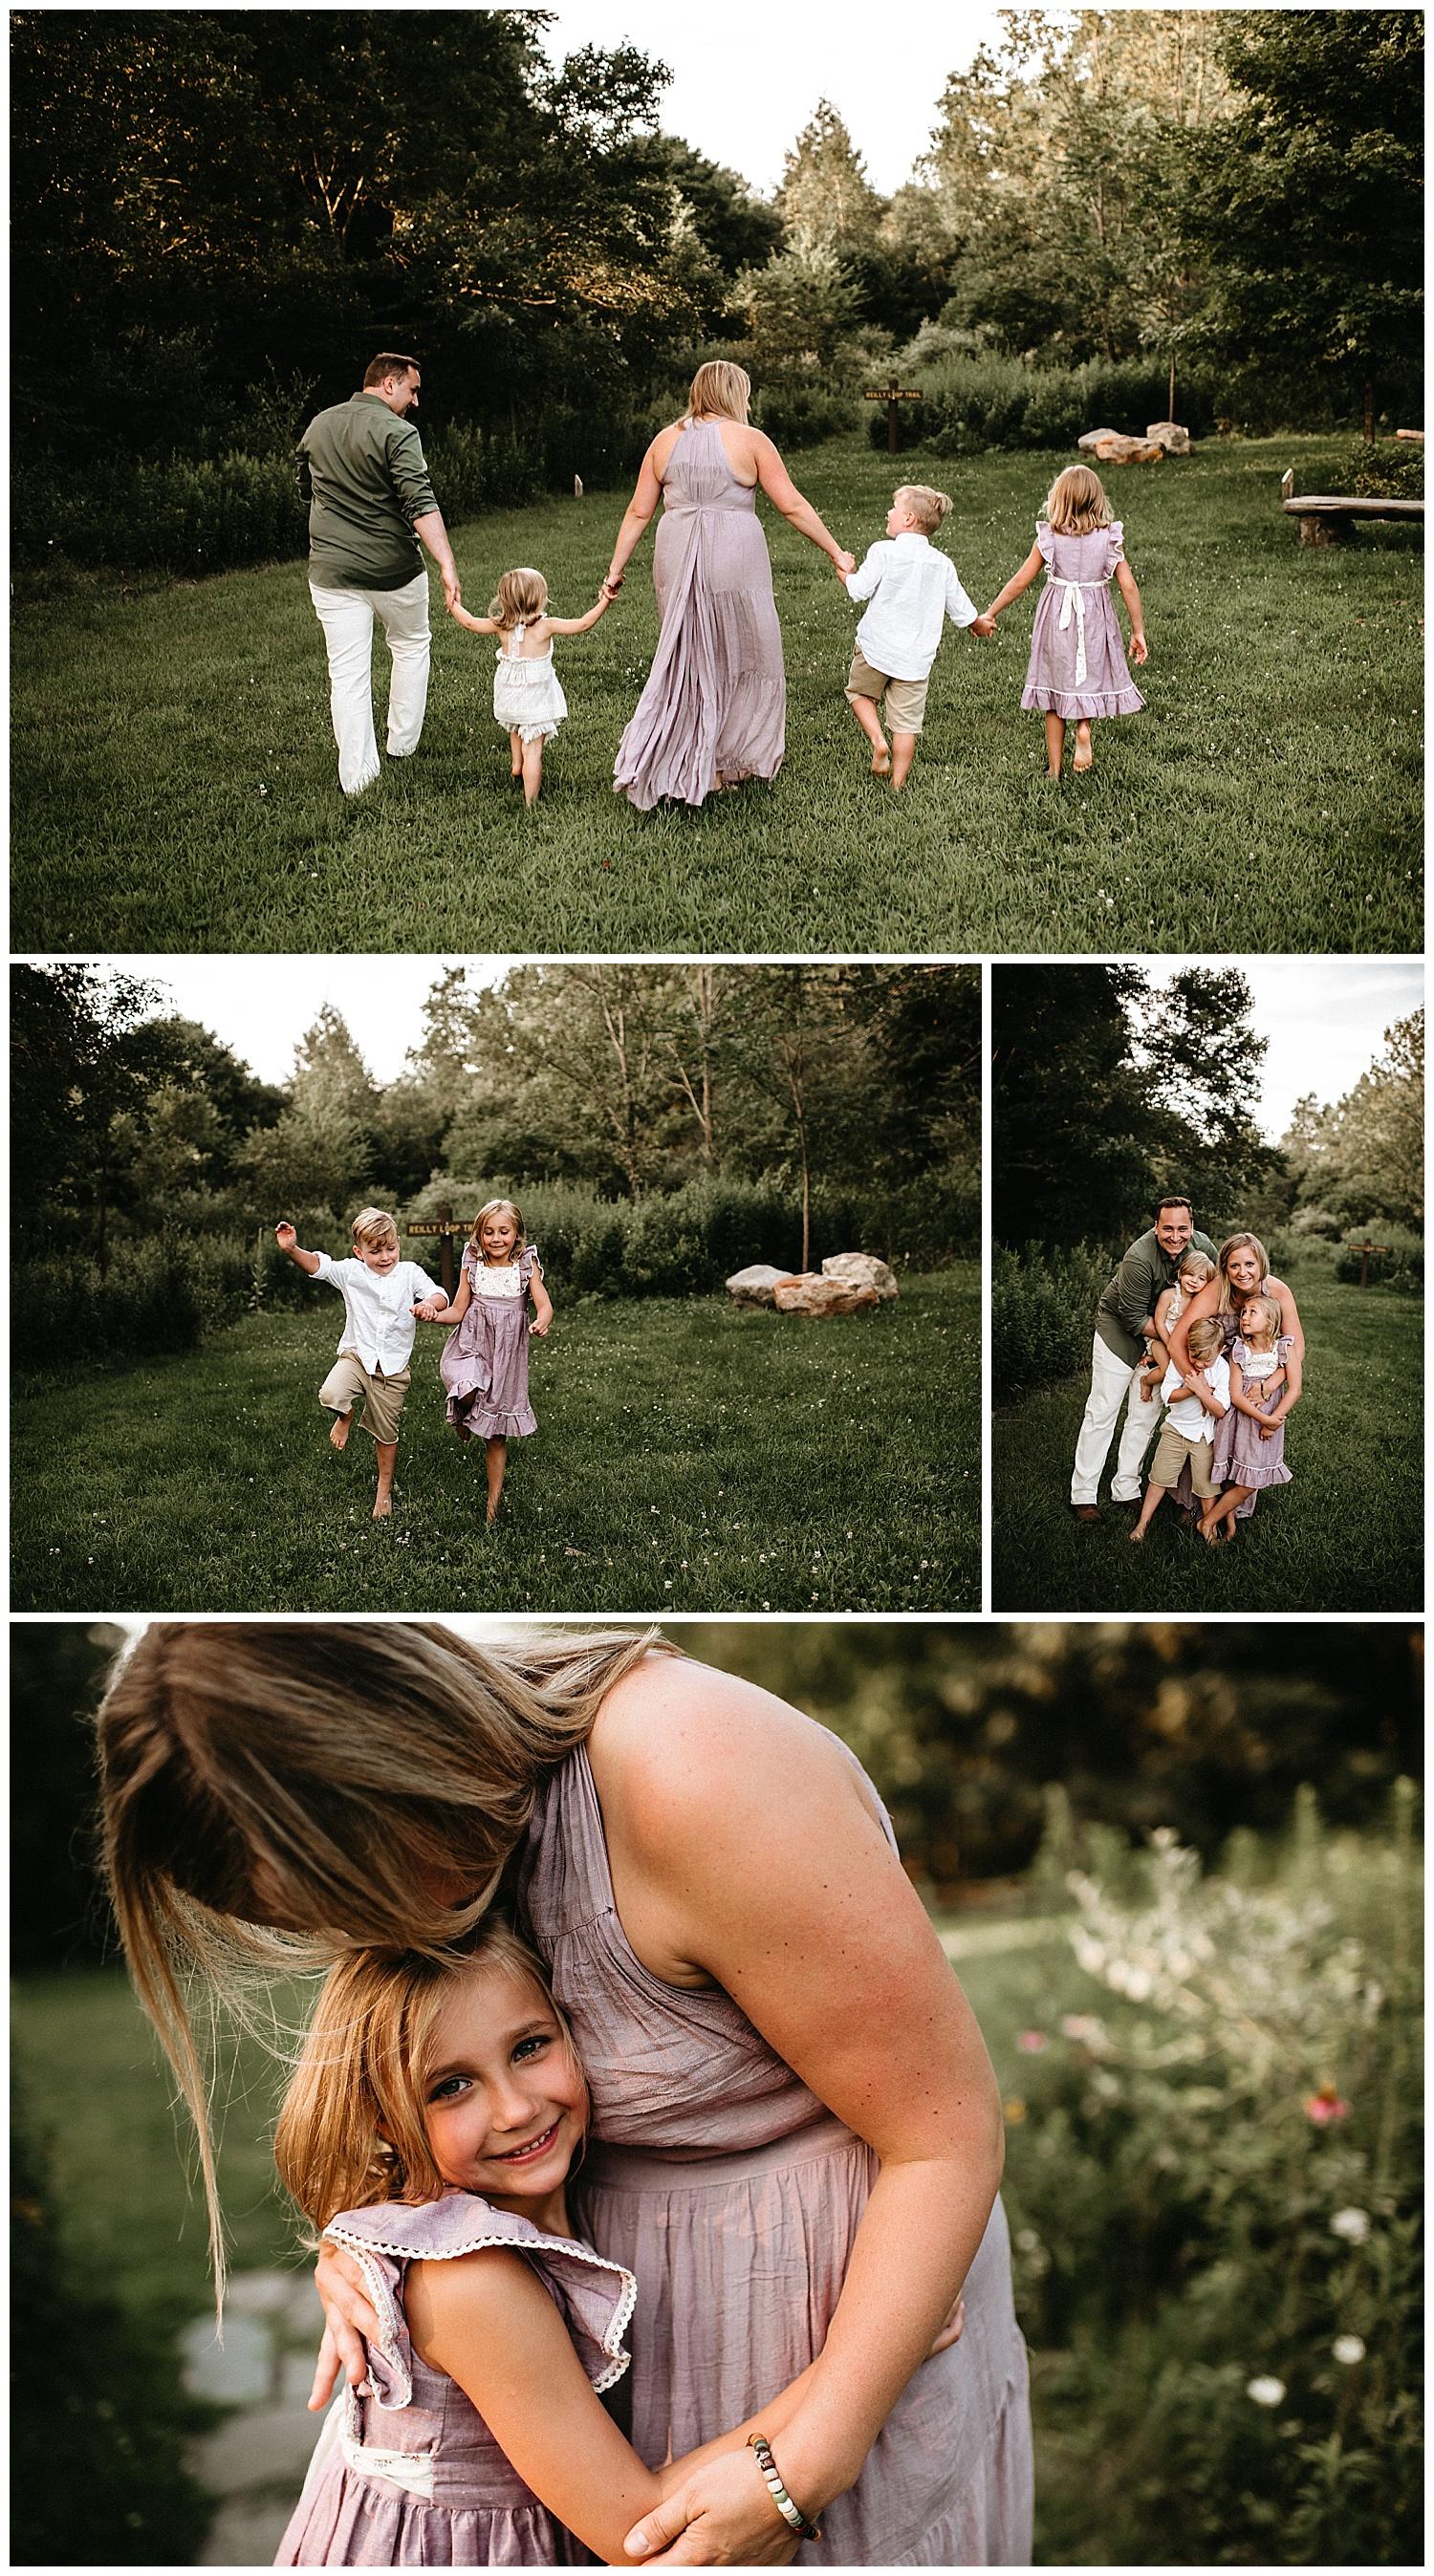 NEPA-Family-Photographer-in-Wilkes-Barre-PA_0163.jpg